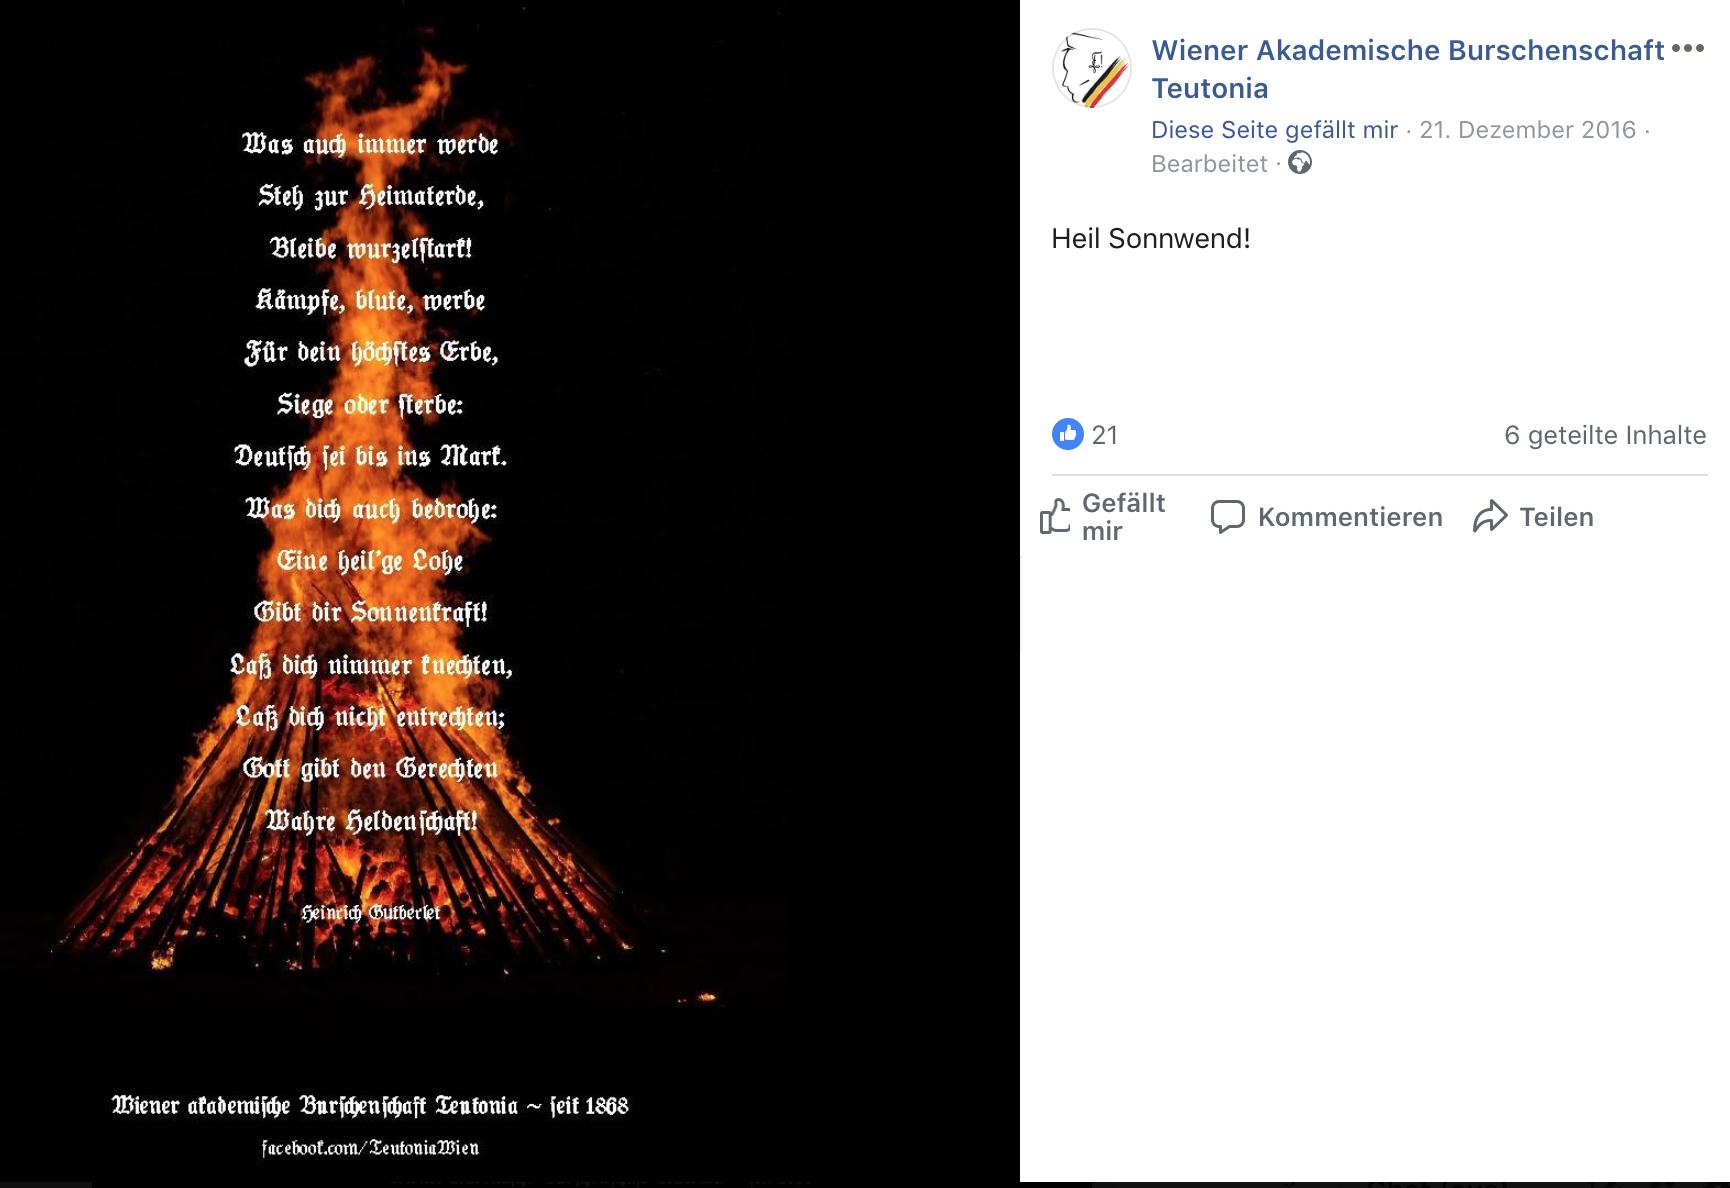 Teutonia: Feuerspruch (Heinrich Gutberlet)